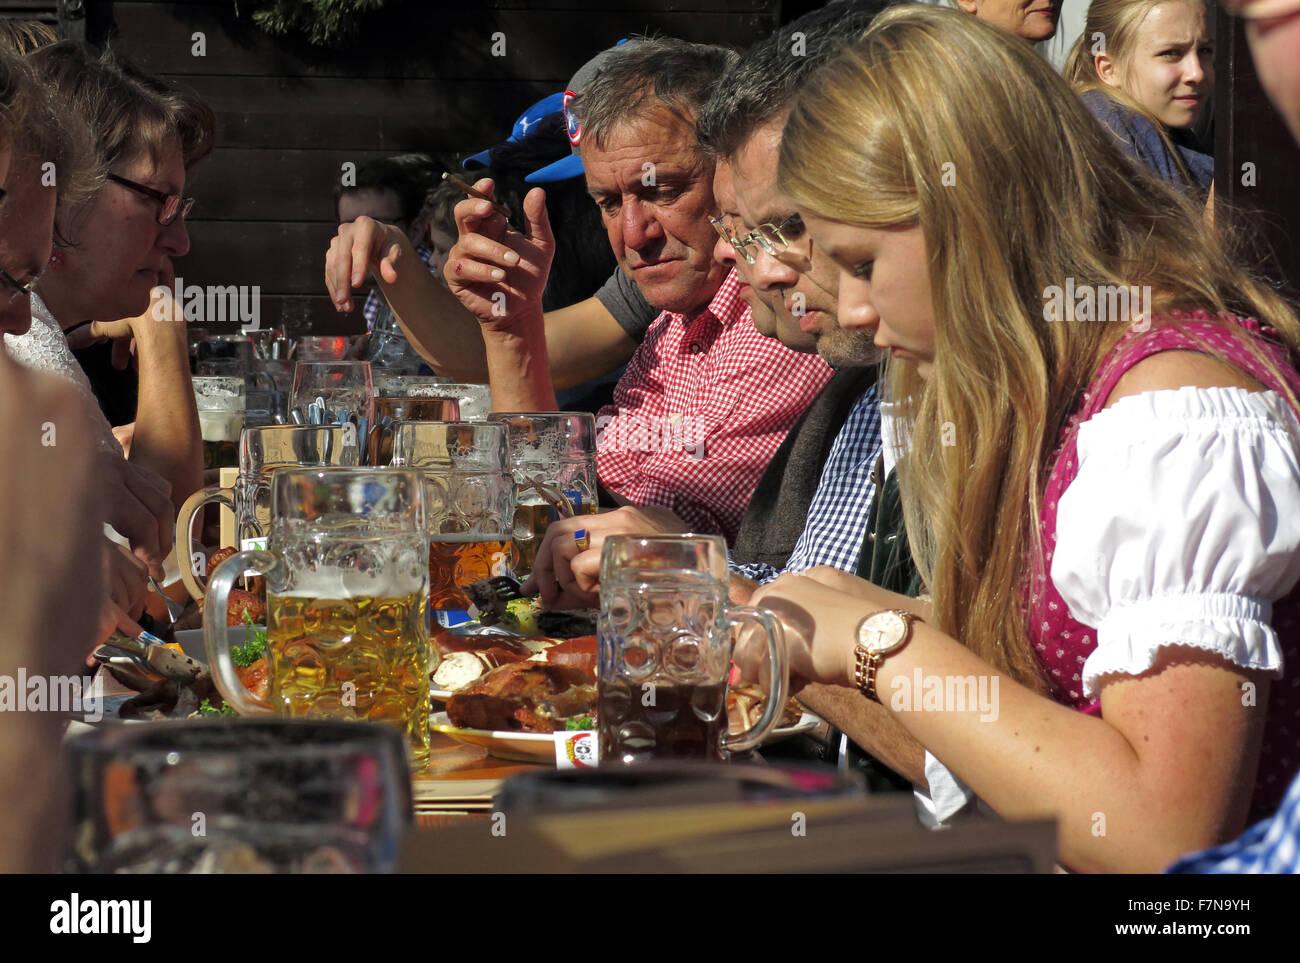 October,Autumn,tourist,tourists,in,Munchen,bier,Garten,bright,sunny,happy,tree,trees,table,tables,fun,enjoyment,tourism,ticket,tickets,Ammer,traditional,tradition,Beer garden,Munich Octoberfest,Munich Oktoberfest,GoTonySmith,Munich,Oktoberfest,in,Germany,Volksfest,beer,festival,and,travelling,funfair,Bavaria,event,Wiesn,fairgrounds,Octoberfest,October,Autumn,Theresienwiese,field,or,meadow,of,Therese,centre,beer,center,bier,roast,pork,chicken,building,buildings,Brezen,pretzels,Knödel,potato,bread,dumplings,Käsespätzle,Reiberdatschi,pancake,Sauerkraut,or,Rotkohl,Blaukraut,ale,Dirndl,Lederhosen,Sennerhut,tent,Buy Pictures of,Buy Images Of,Unity Day,Oktoberfest beer,Beer festival